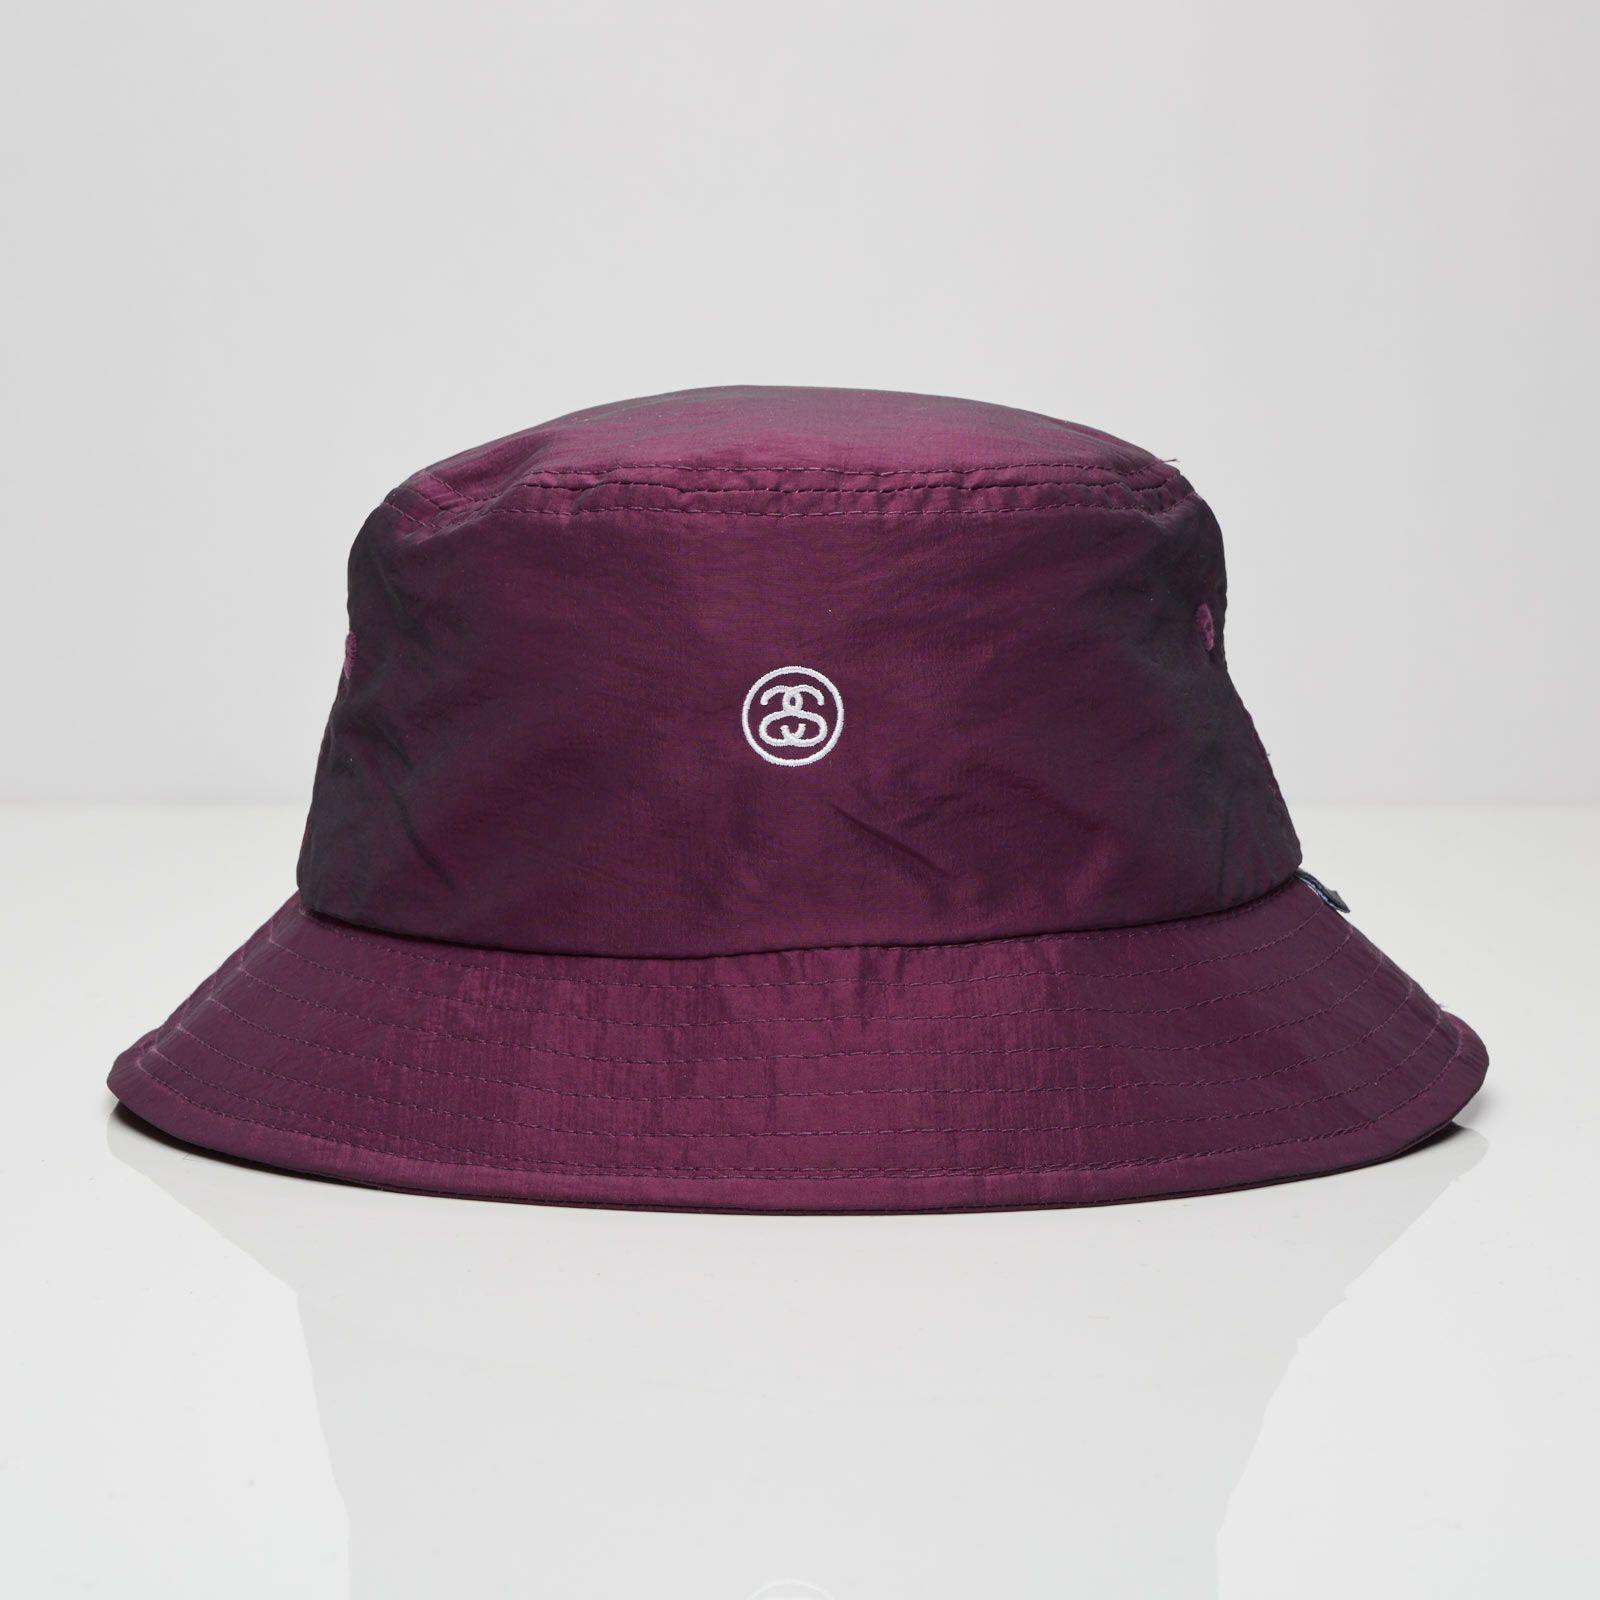 3202f76e9fb Stussy Iridescent Bucket Hat